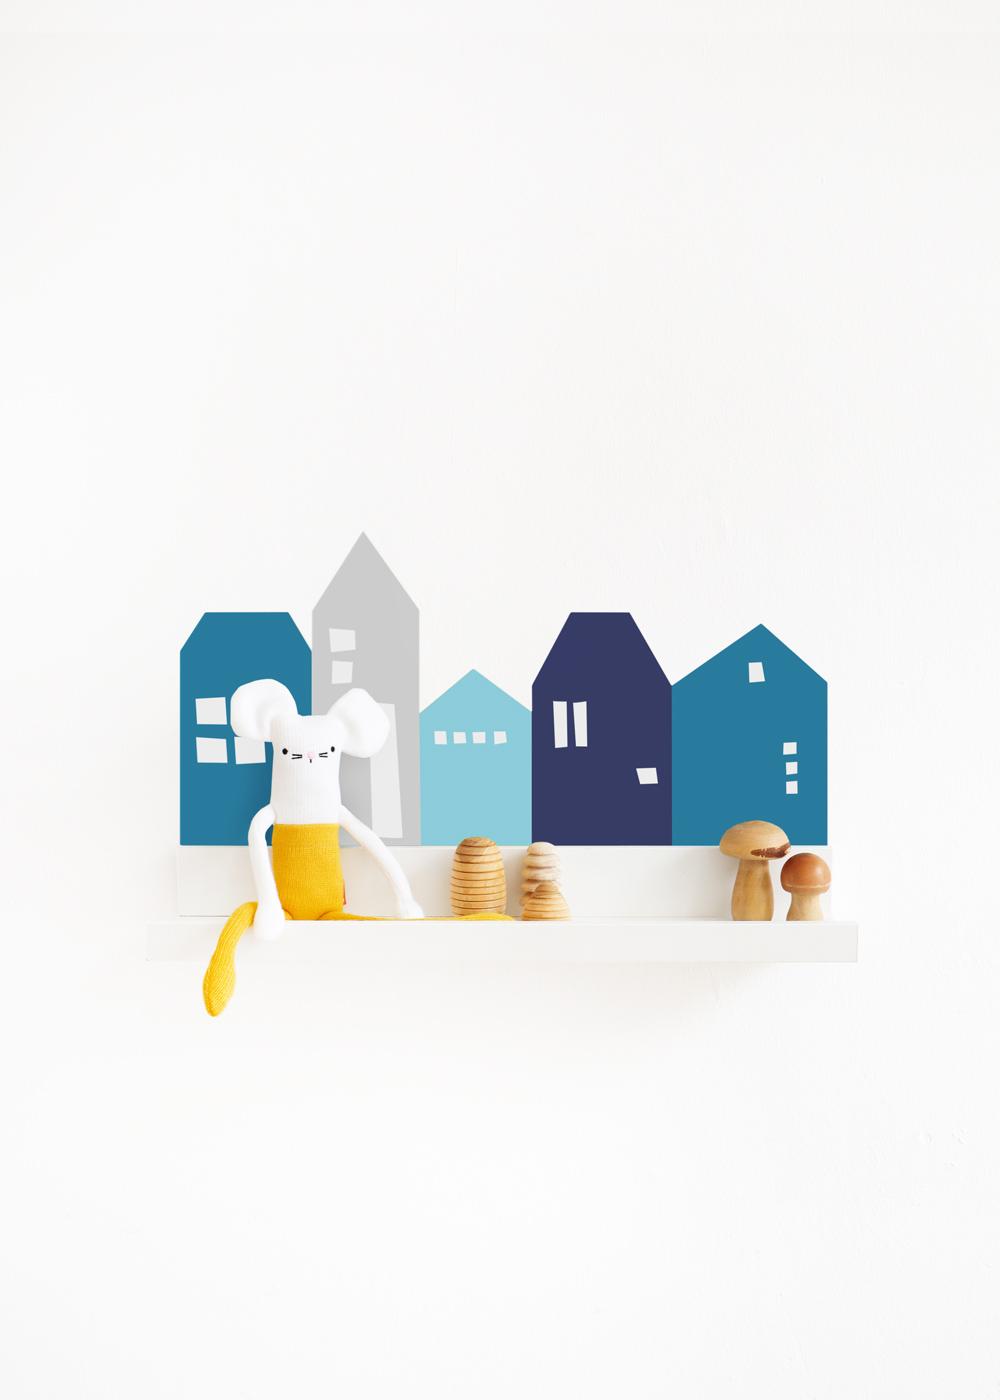 Ikea Mosslanda Bilderleiste Lille Hus blau hellgrau Komplettansicht